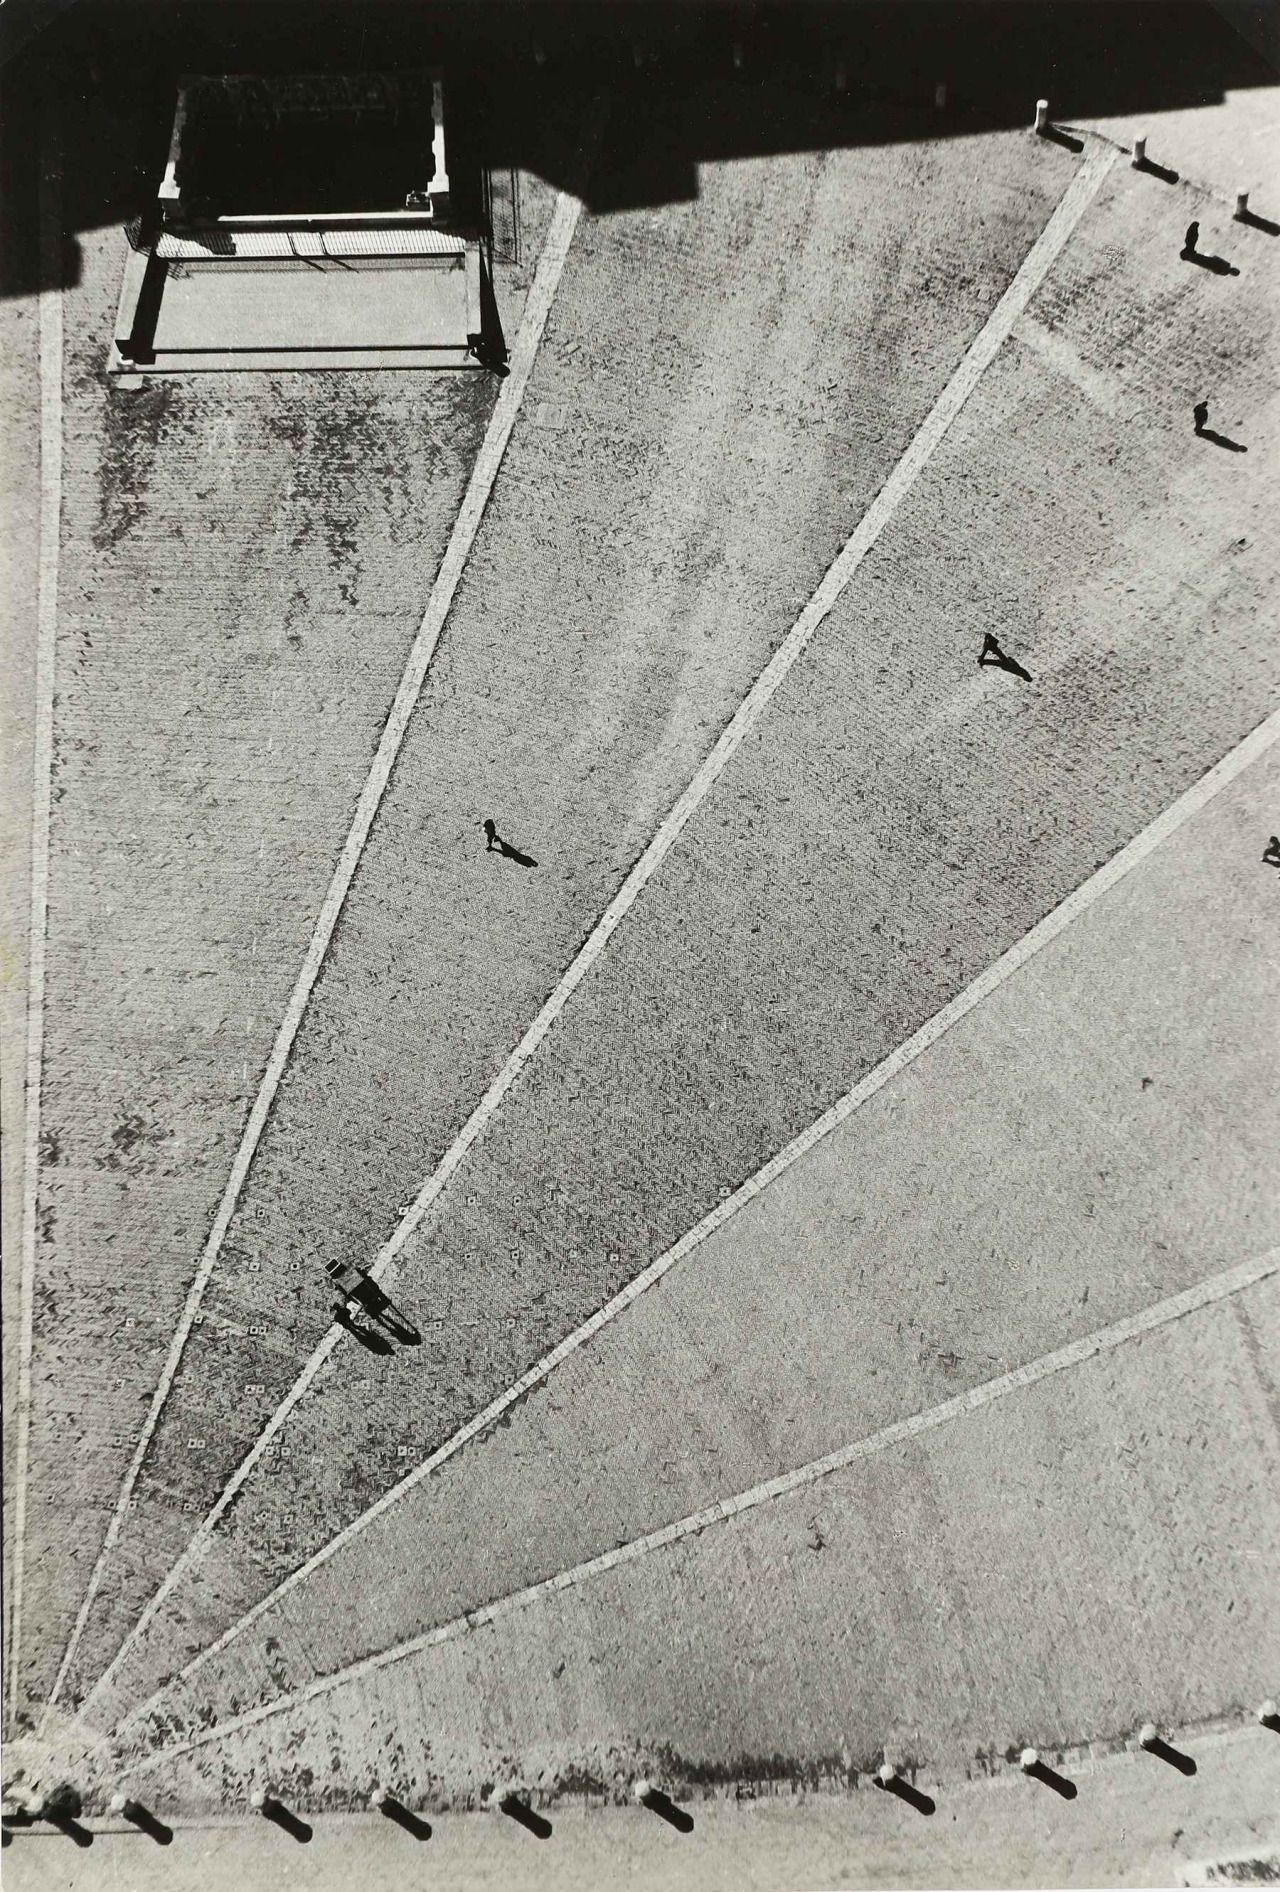 Riccardo Moncalvo Siena La Piazza C 1950 Photography I B W  # Bozzetto Muebles